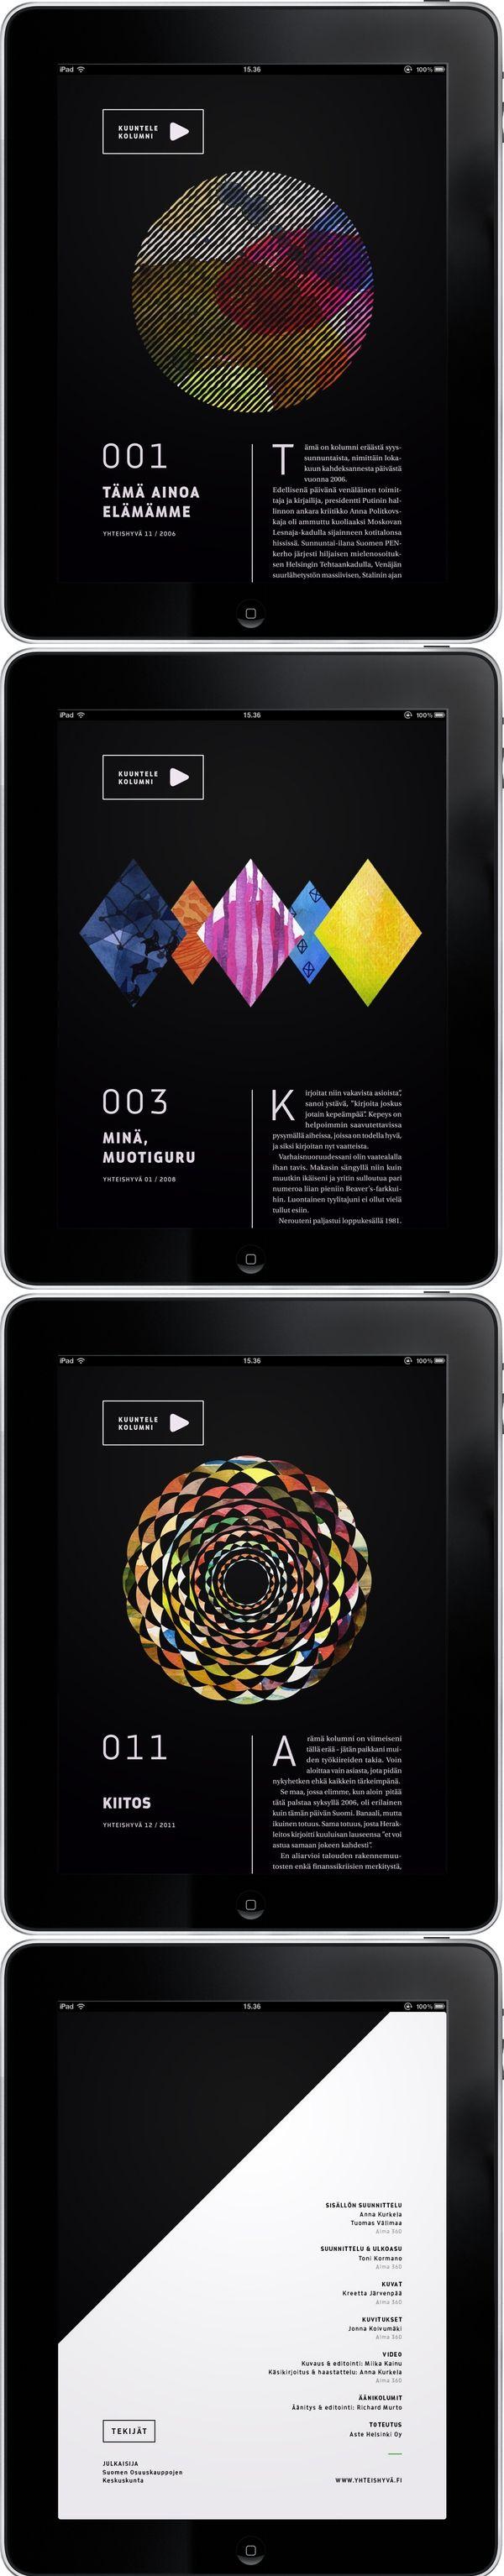 Kjell Westö iPad Publication. |  #appdesign #interface #design